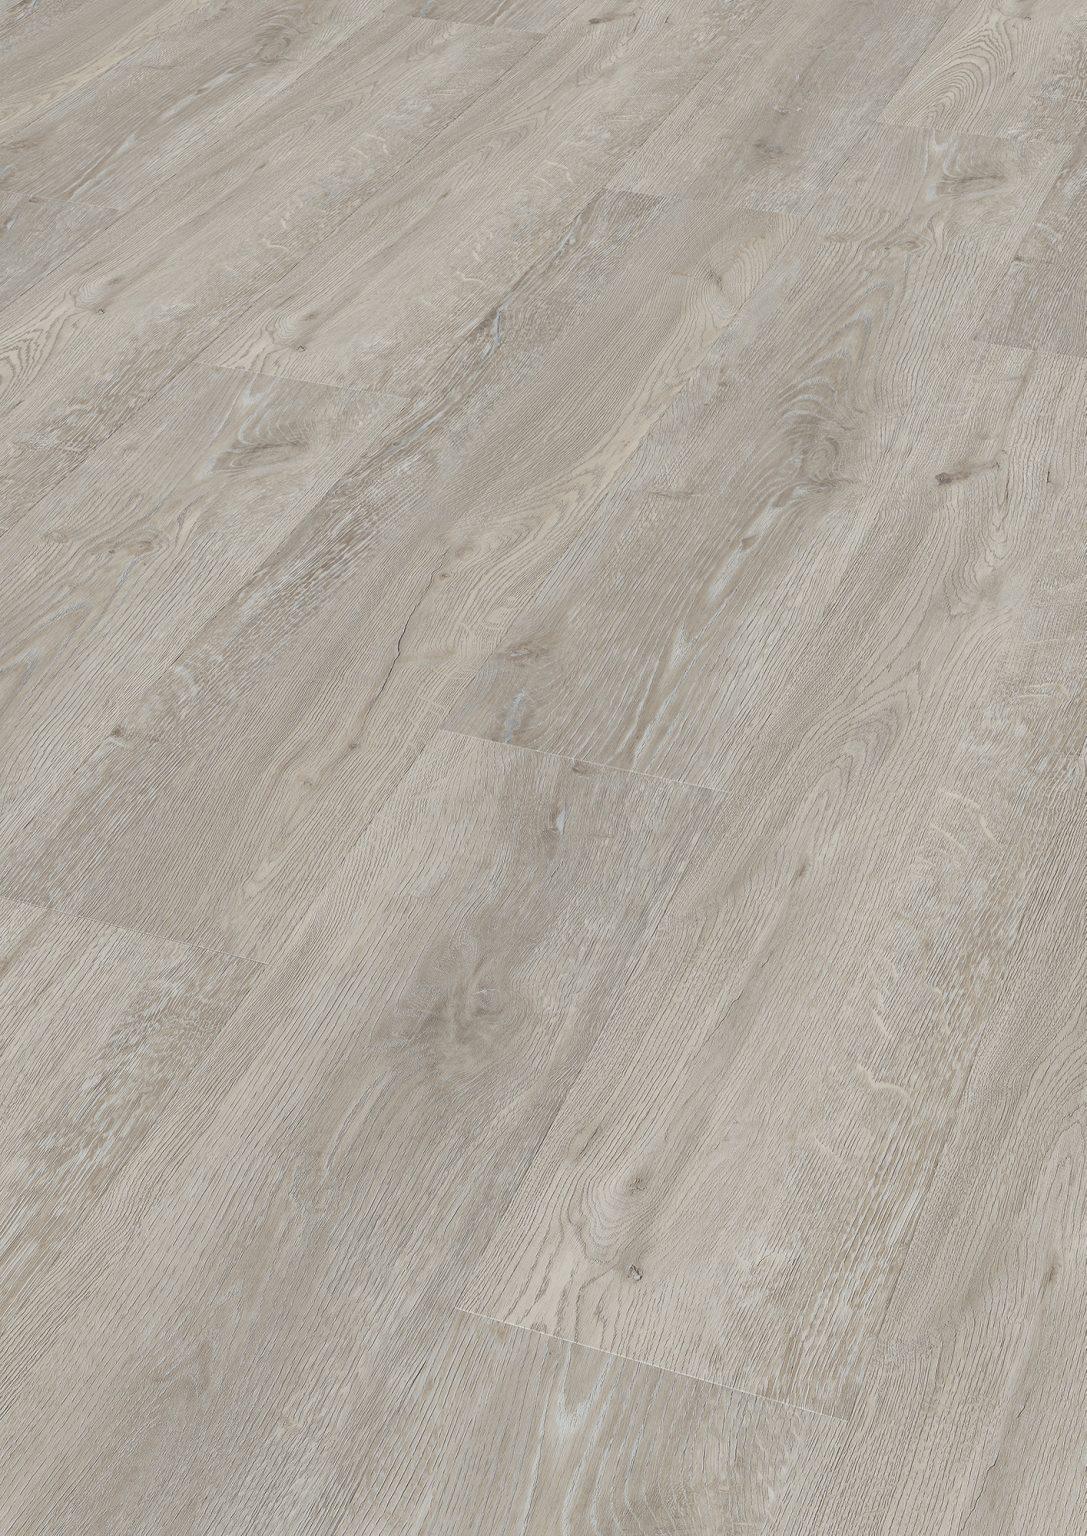 Moderna V-rigid  premium vinilinės grindys, Bali oak 33 klasė, 4.5 mm